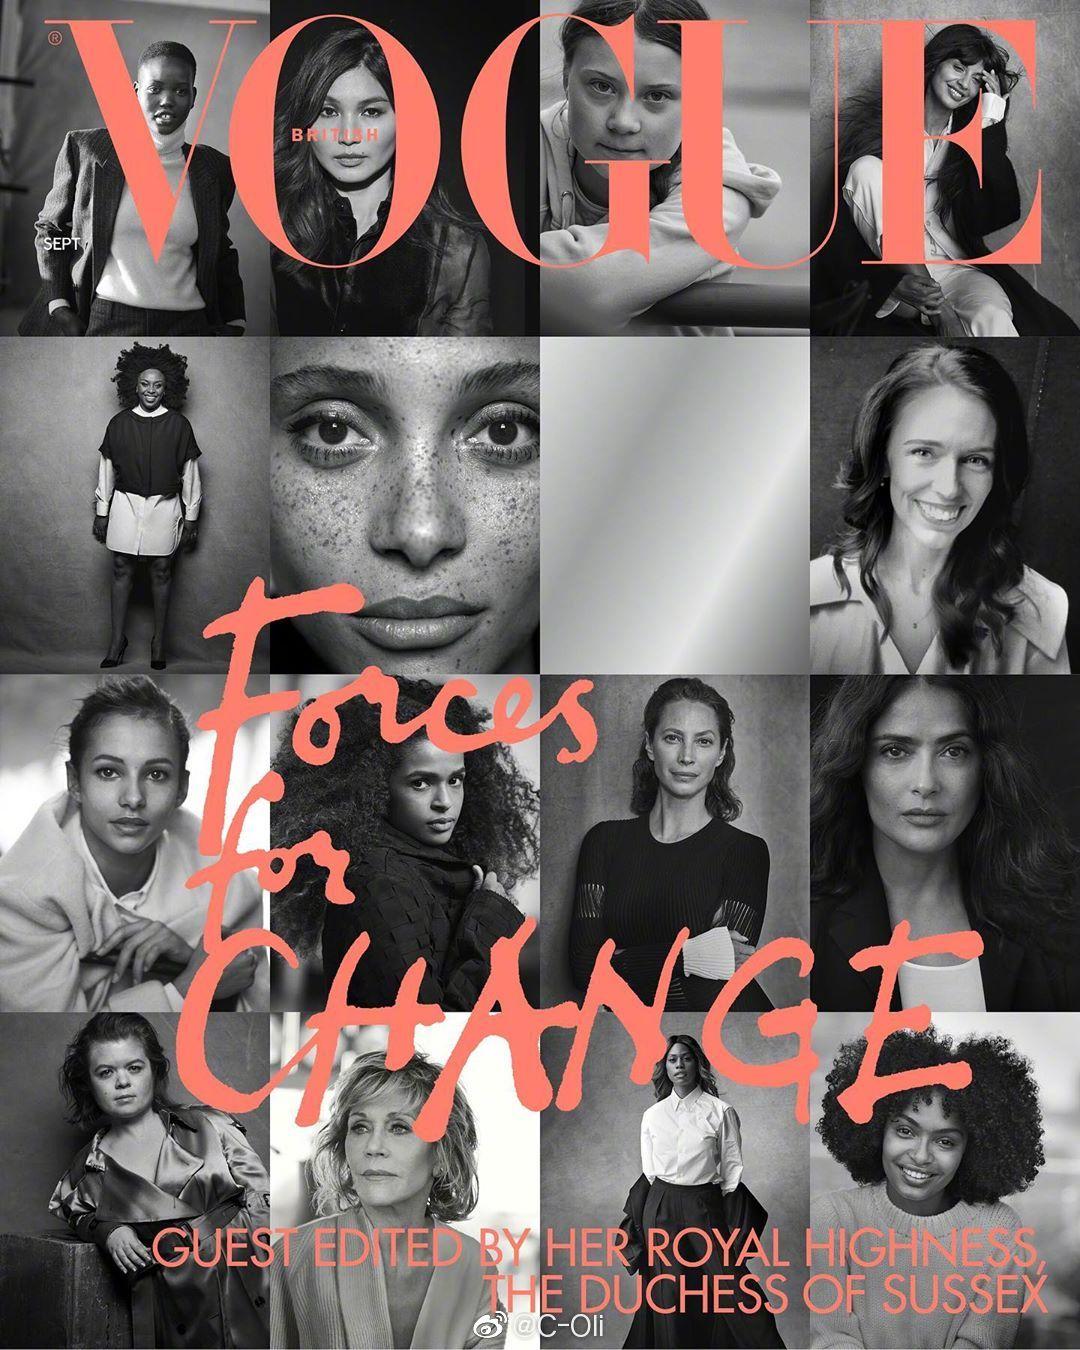 Adut Akech九月刊Vogue一共收获5封:英、意、德、日、澳(digital)